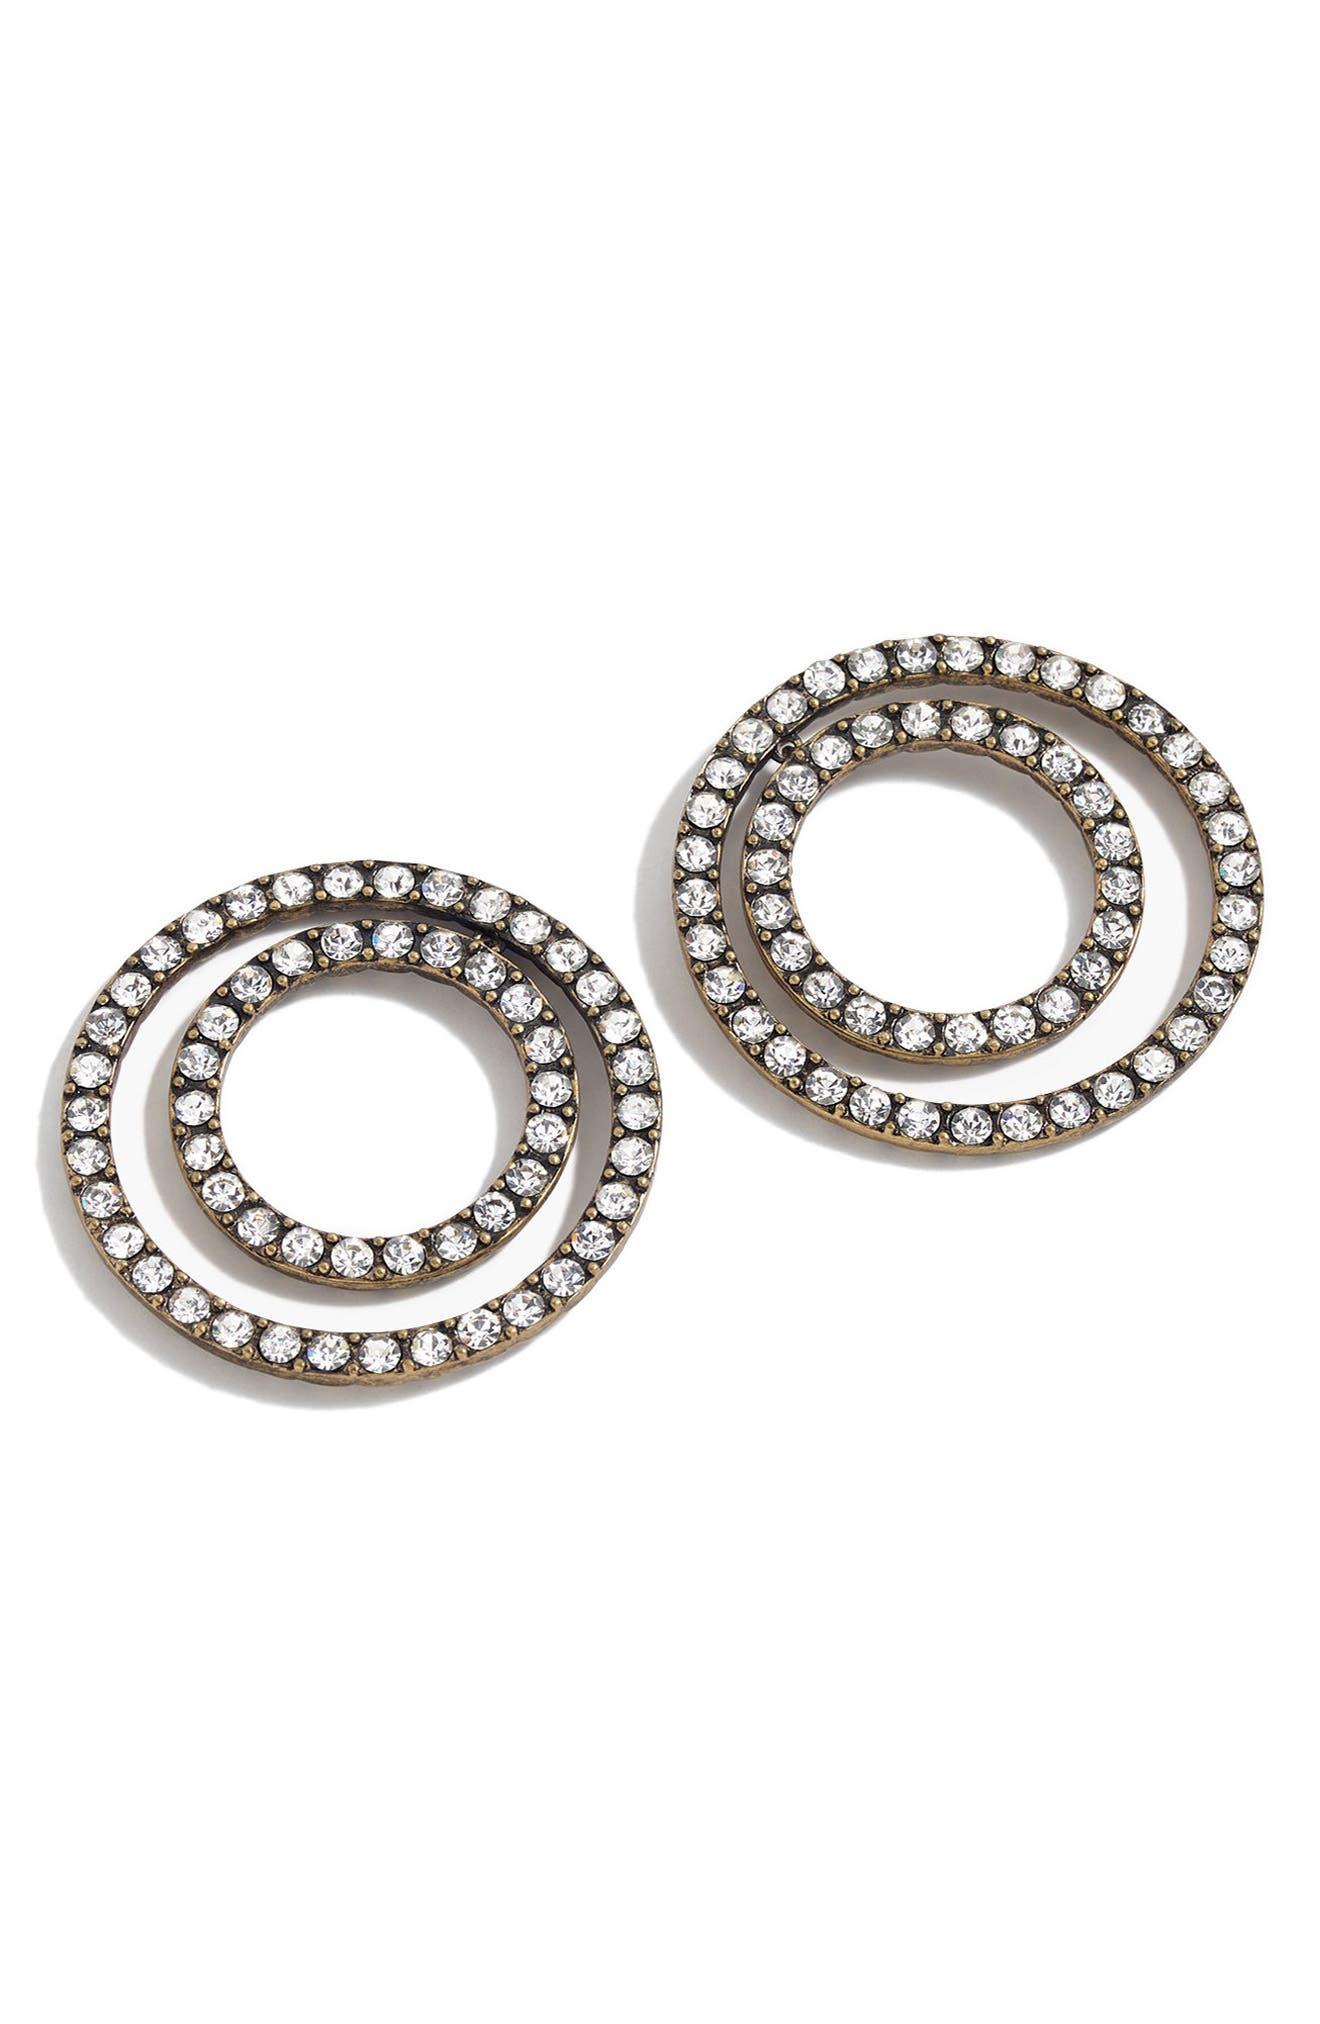 Sparkle Double Circle Earrings,                             Main thumbnail 1, color,                             020